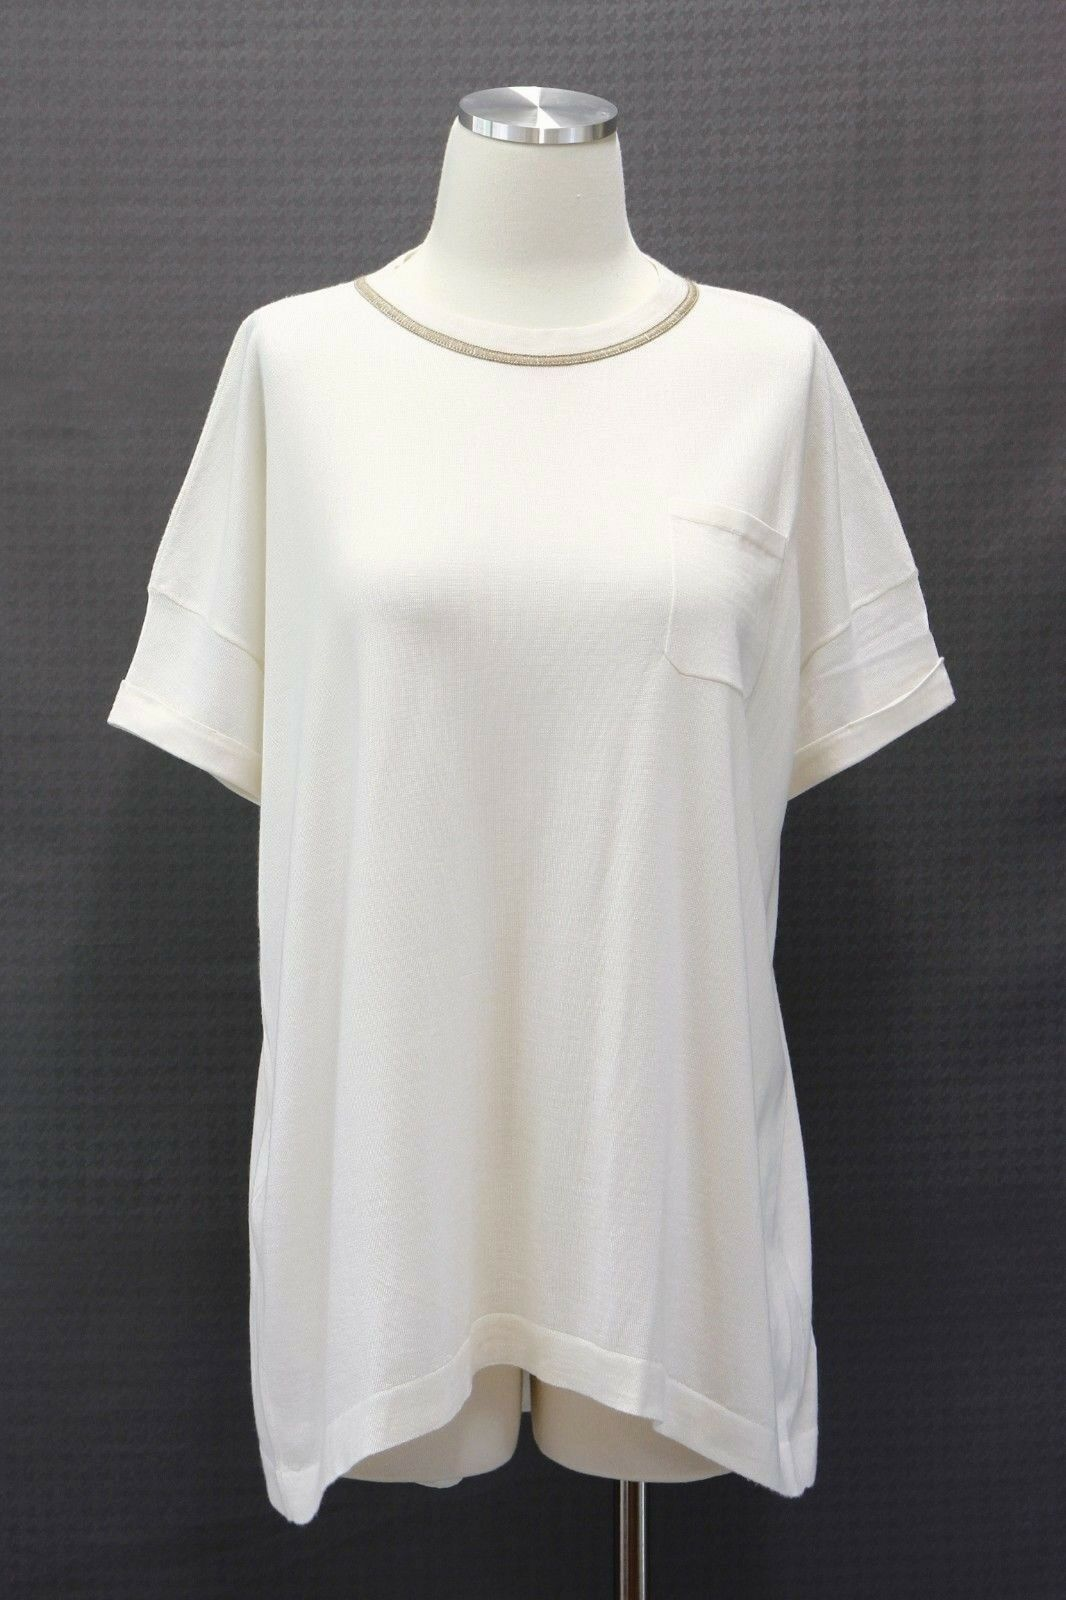 NWT 2525 Brunello Cucinelli Cashmere-Silk Monili Collar Beaded Knit Top SzM A186